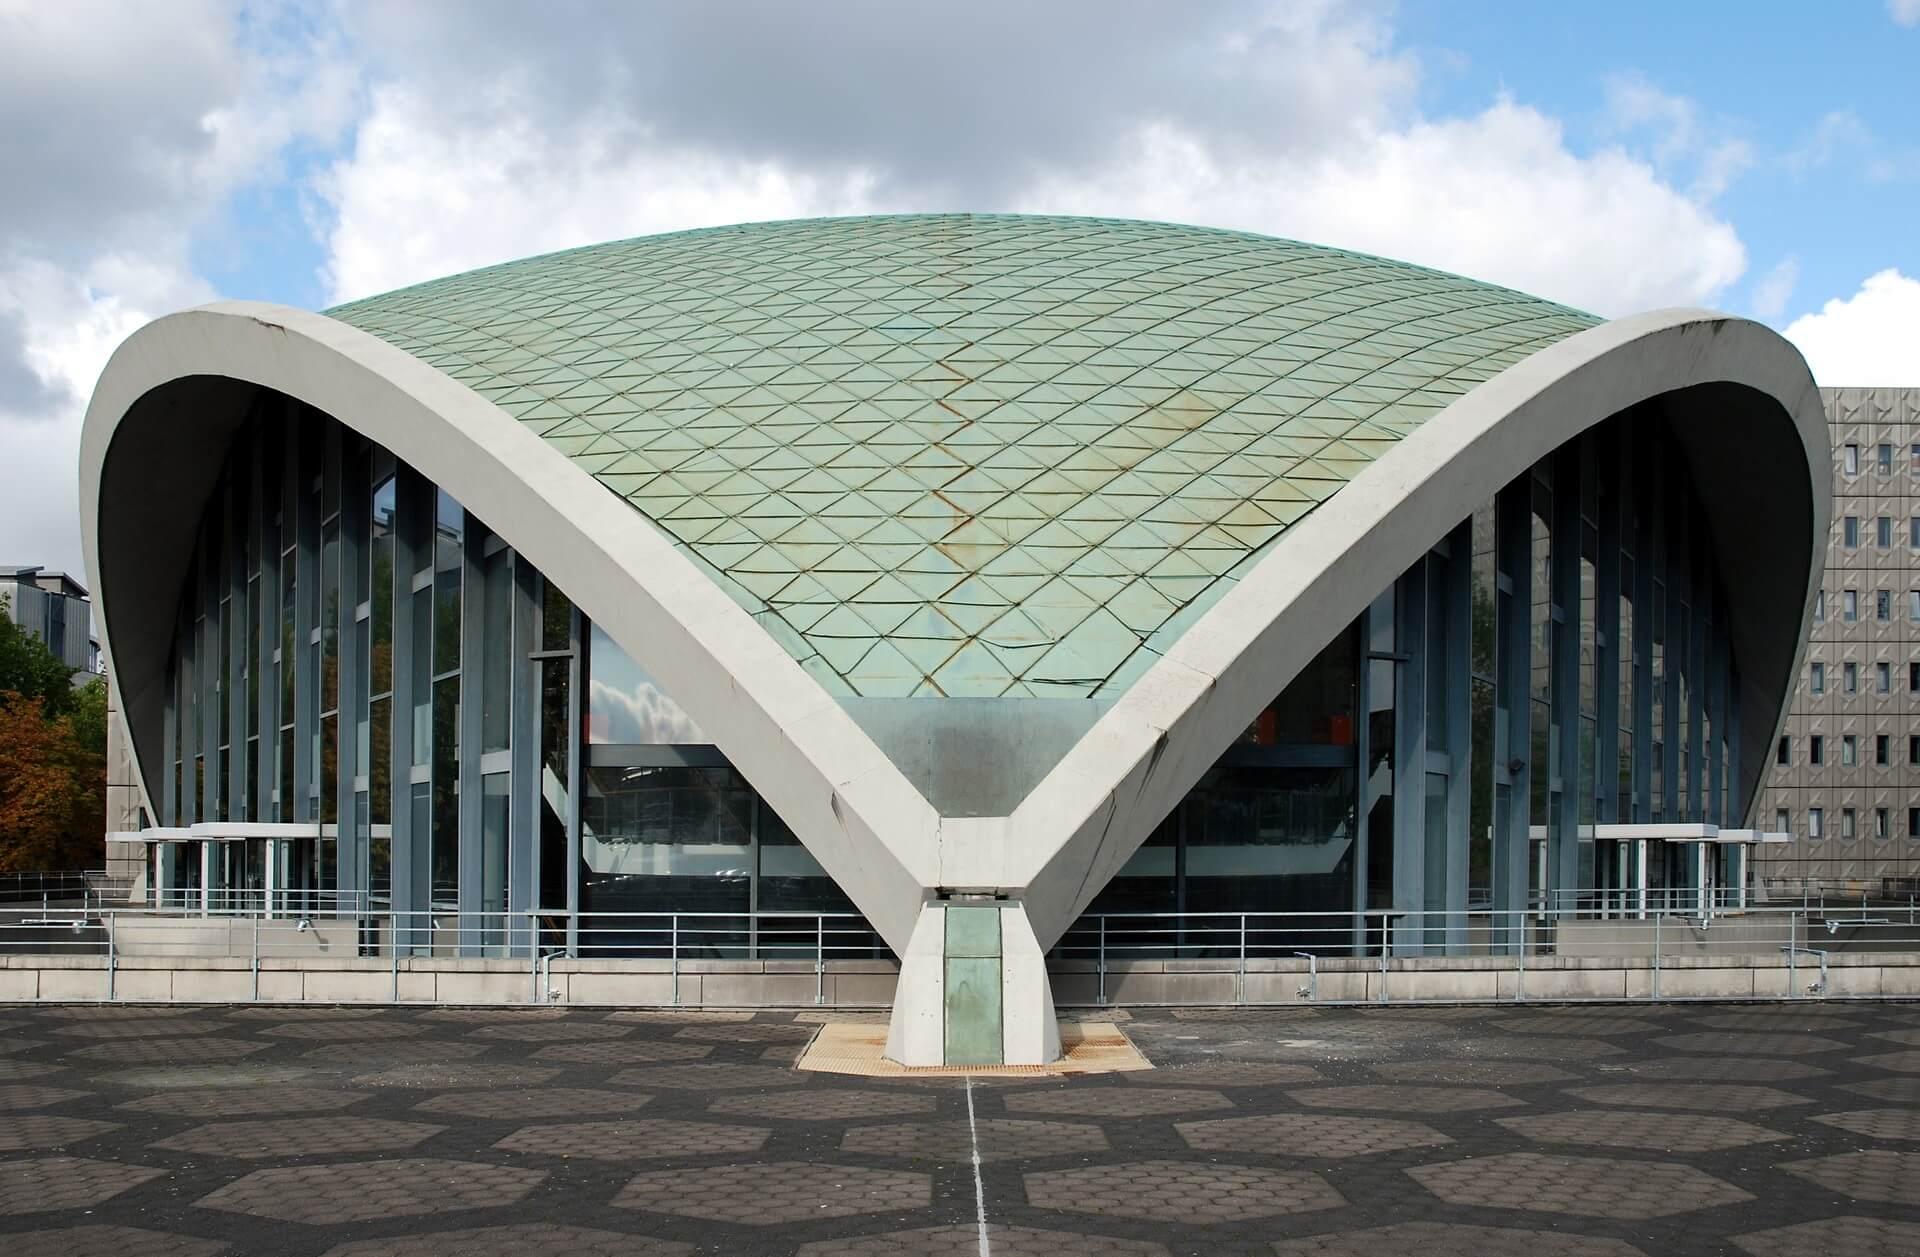 Opera w Dortmund